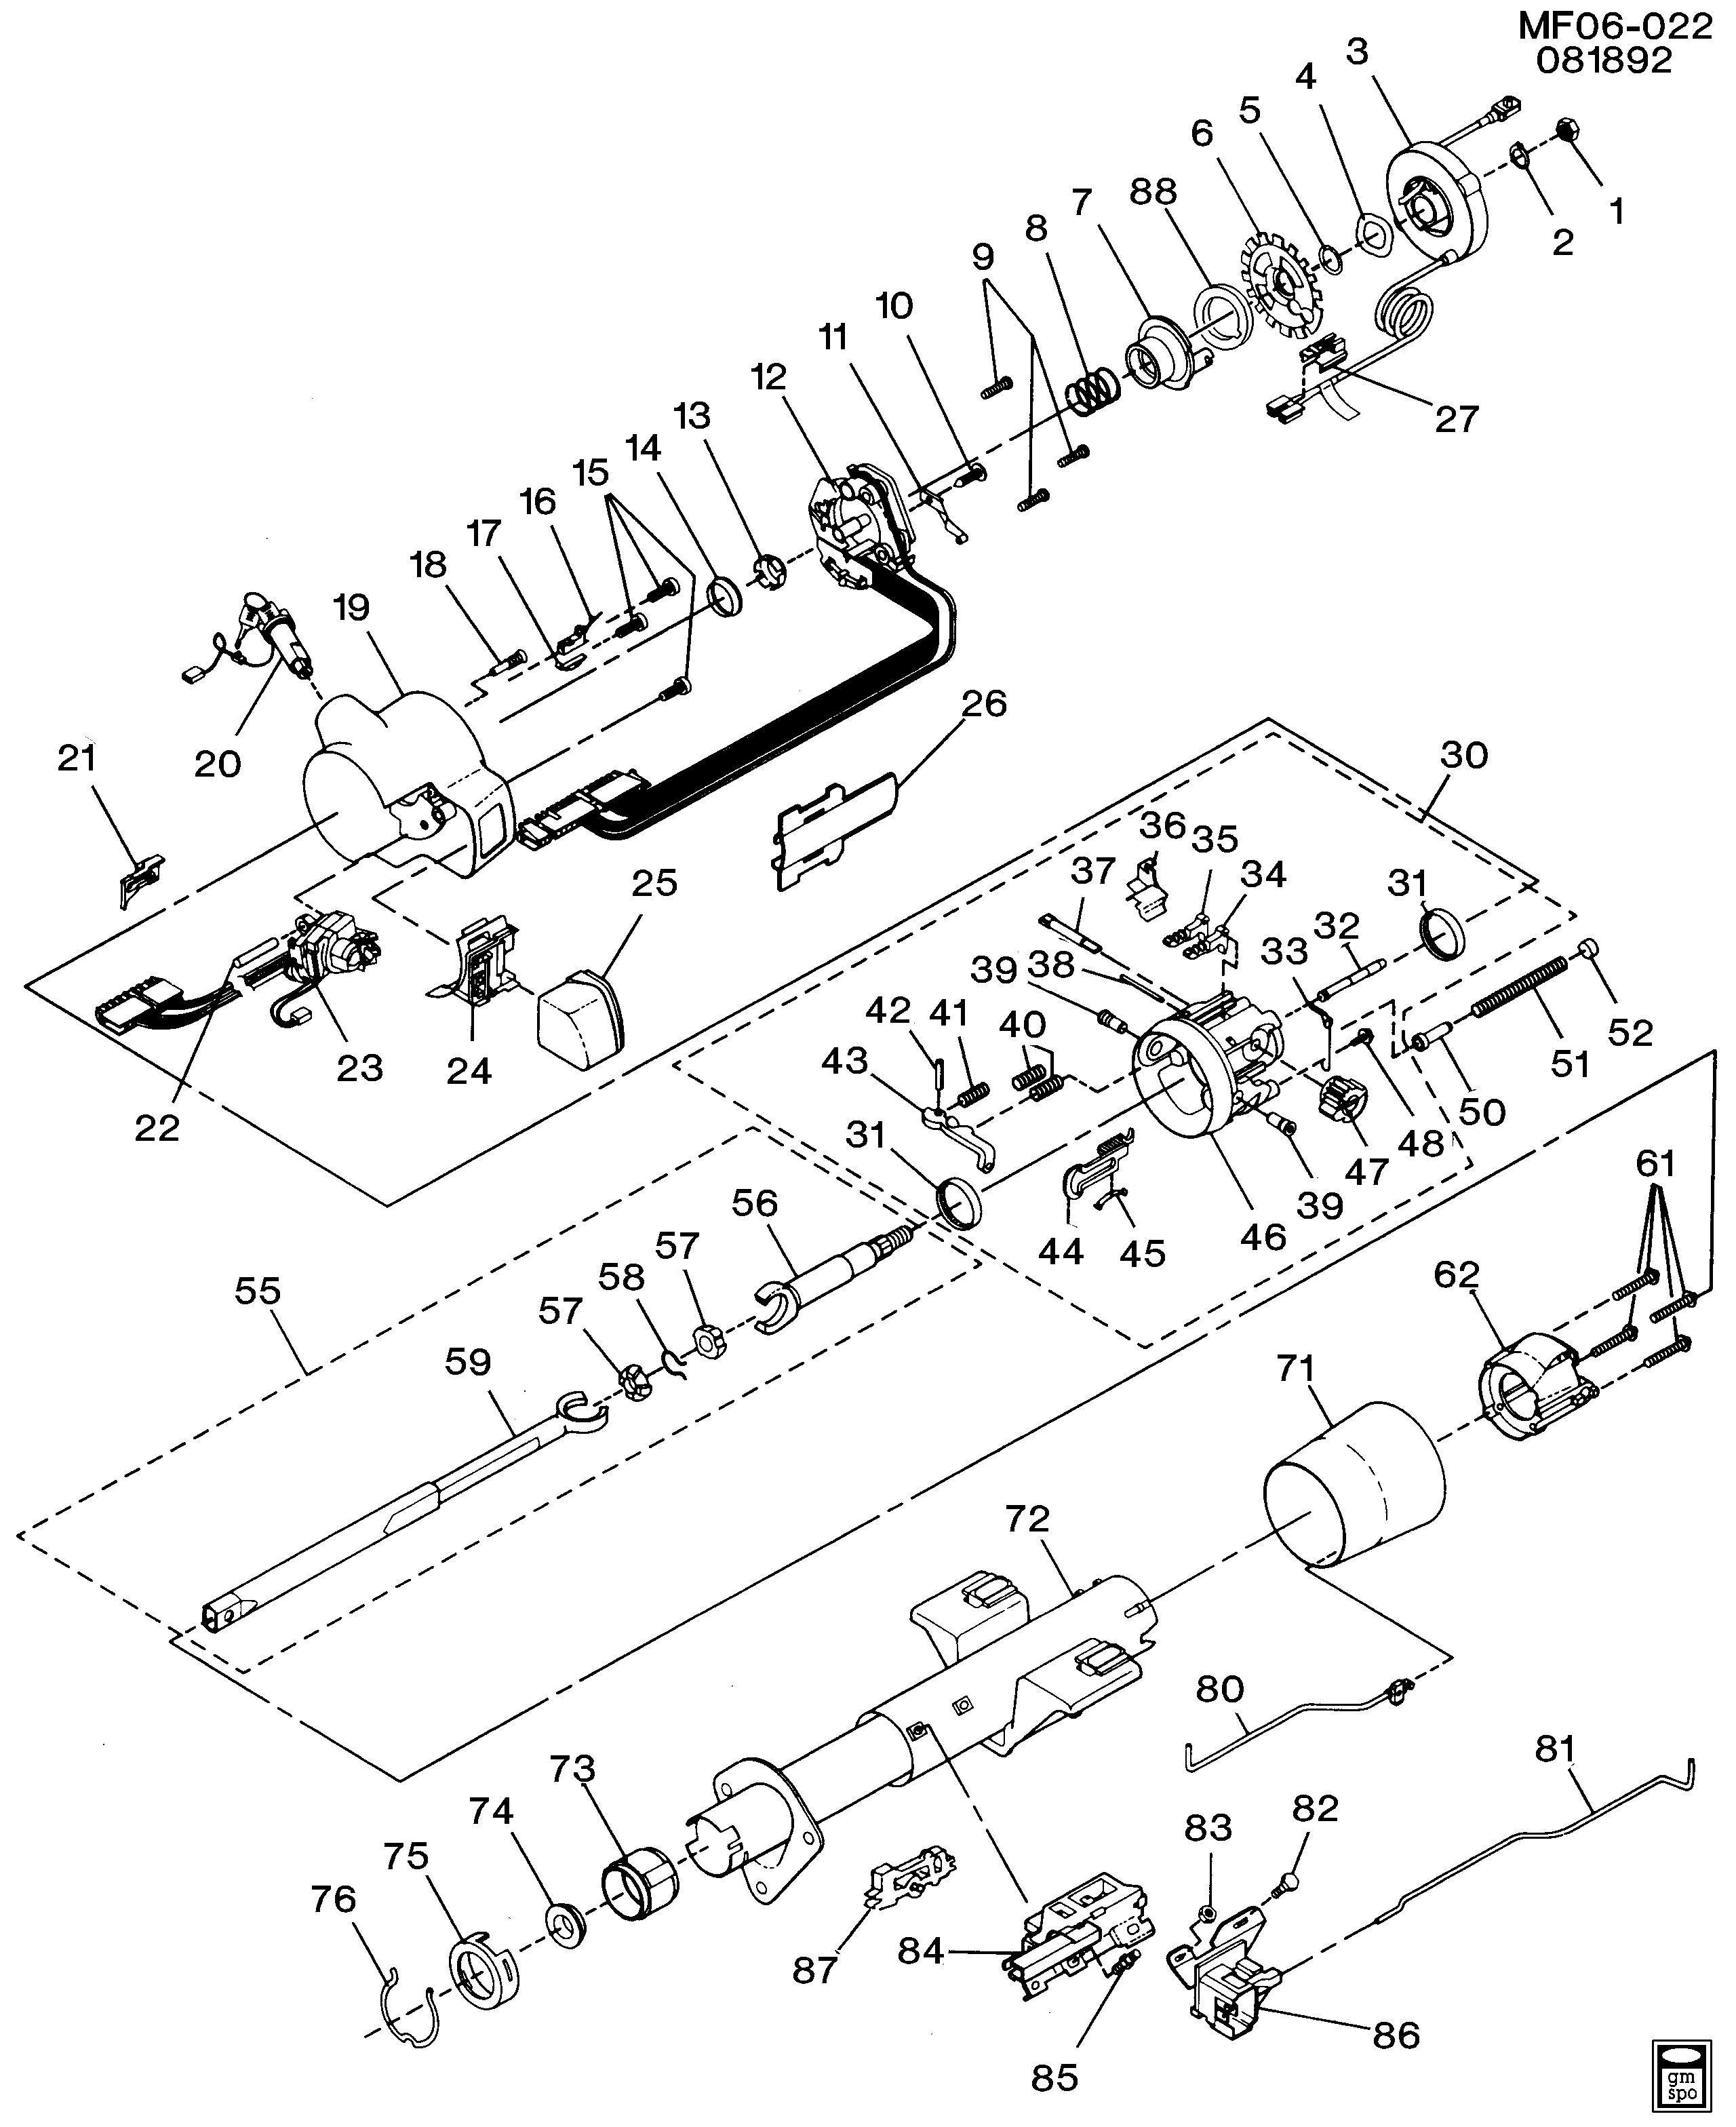 Pontiac Firebird - F STEERING COLUMN/TILT (S I R  F/S, A T